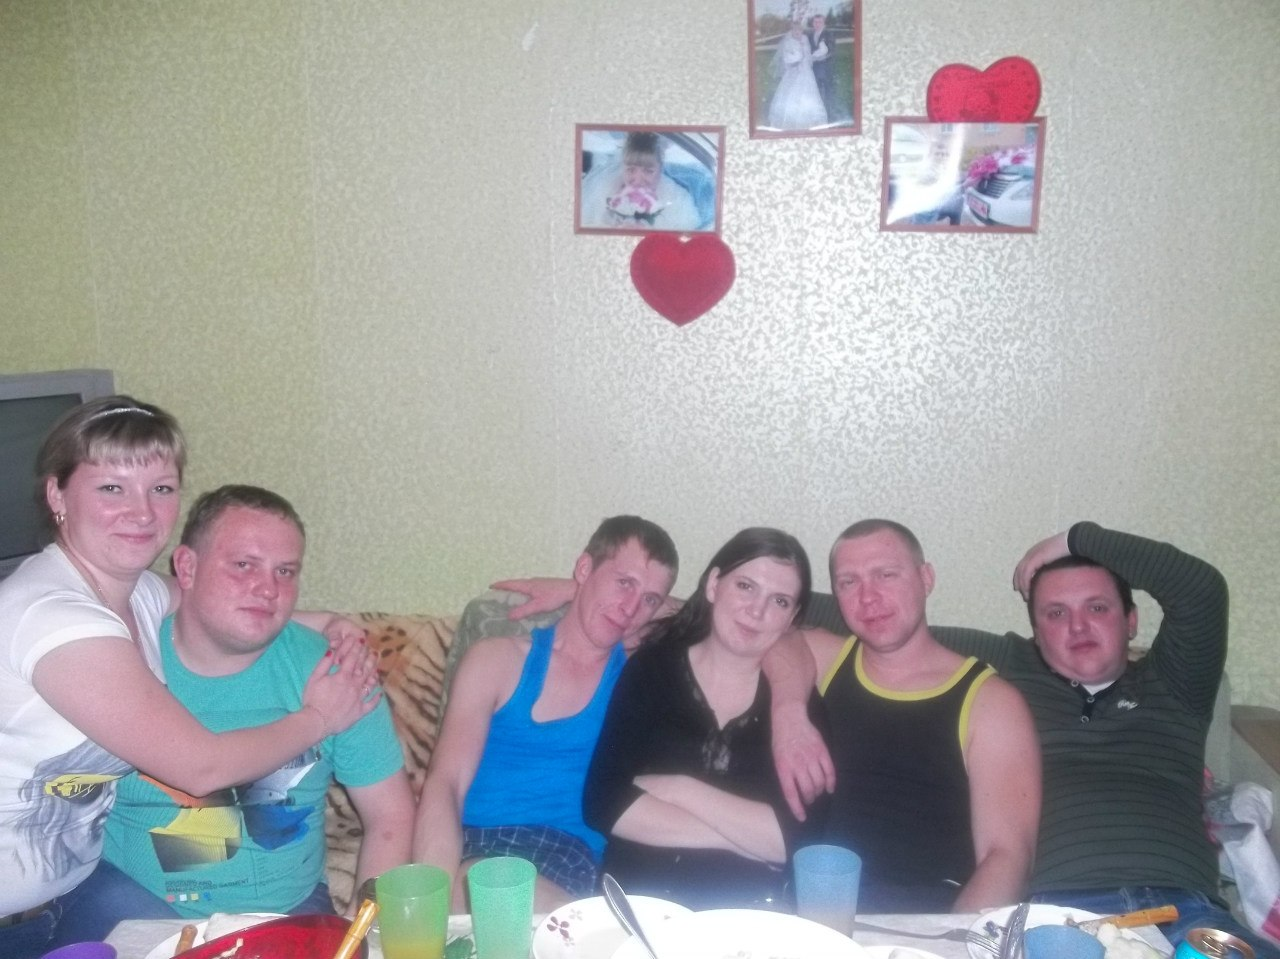 Надя Доброславова, Ярославль - фото №10